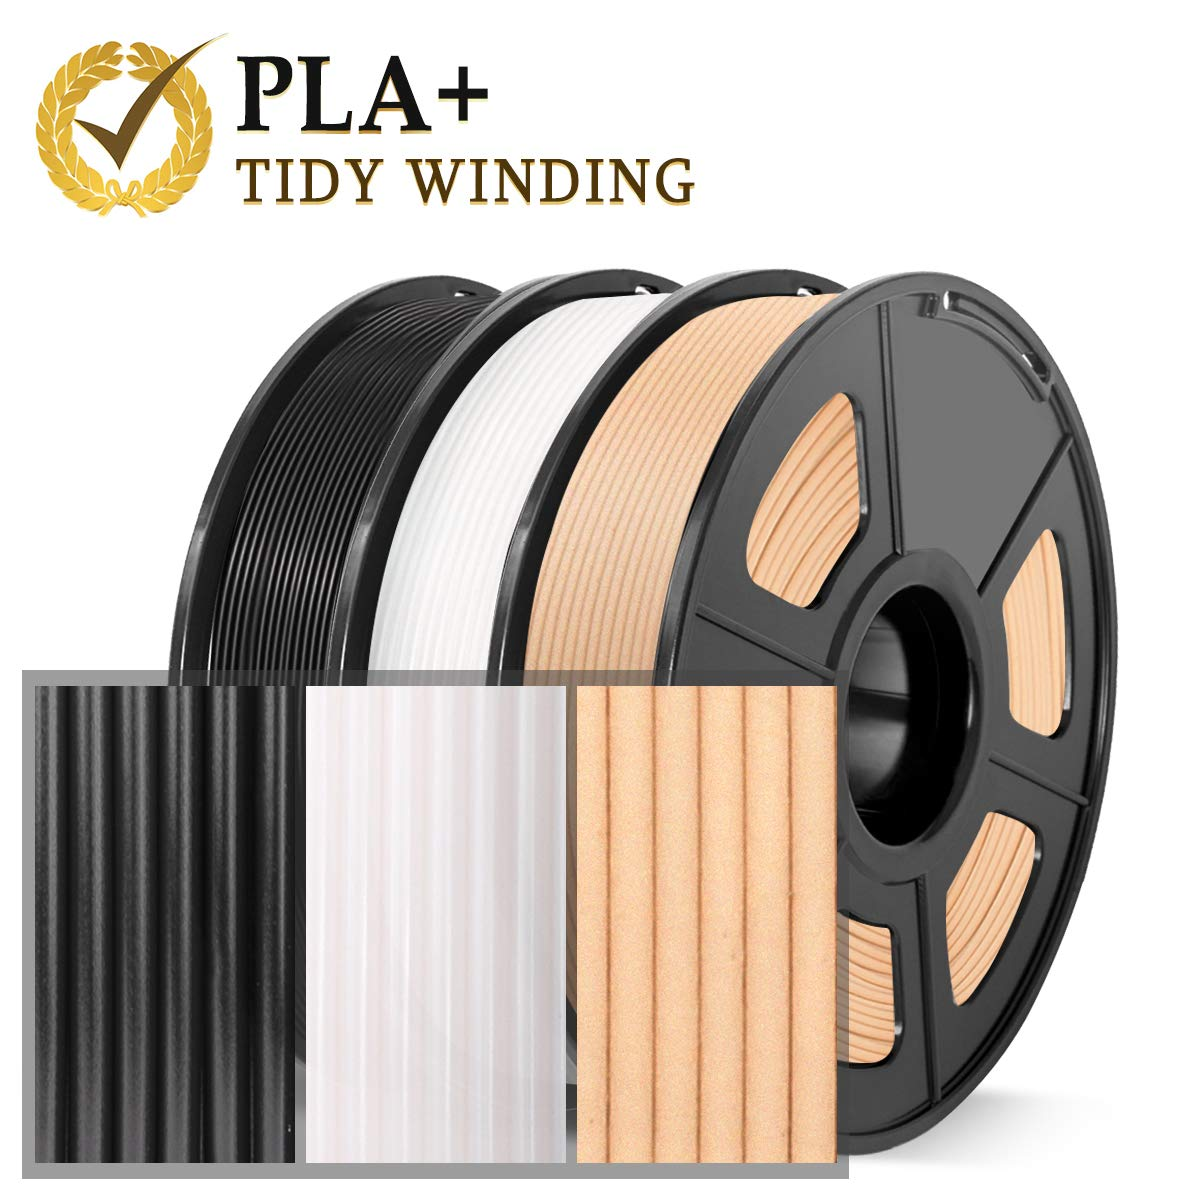 negro 2.2 lb filamento de fibra de carbono PLA de 1.75 mm Filamento de impresora 3D de fibra de carbono filamento de impresora 3D extremadamente r/ígido 1 kg